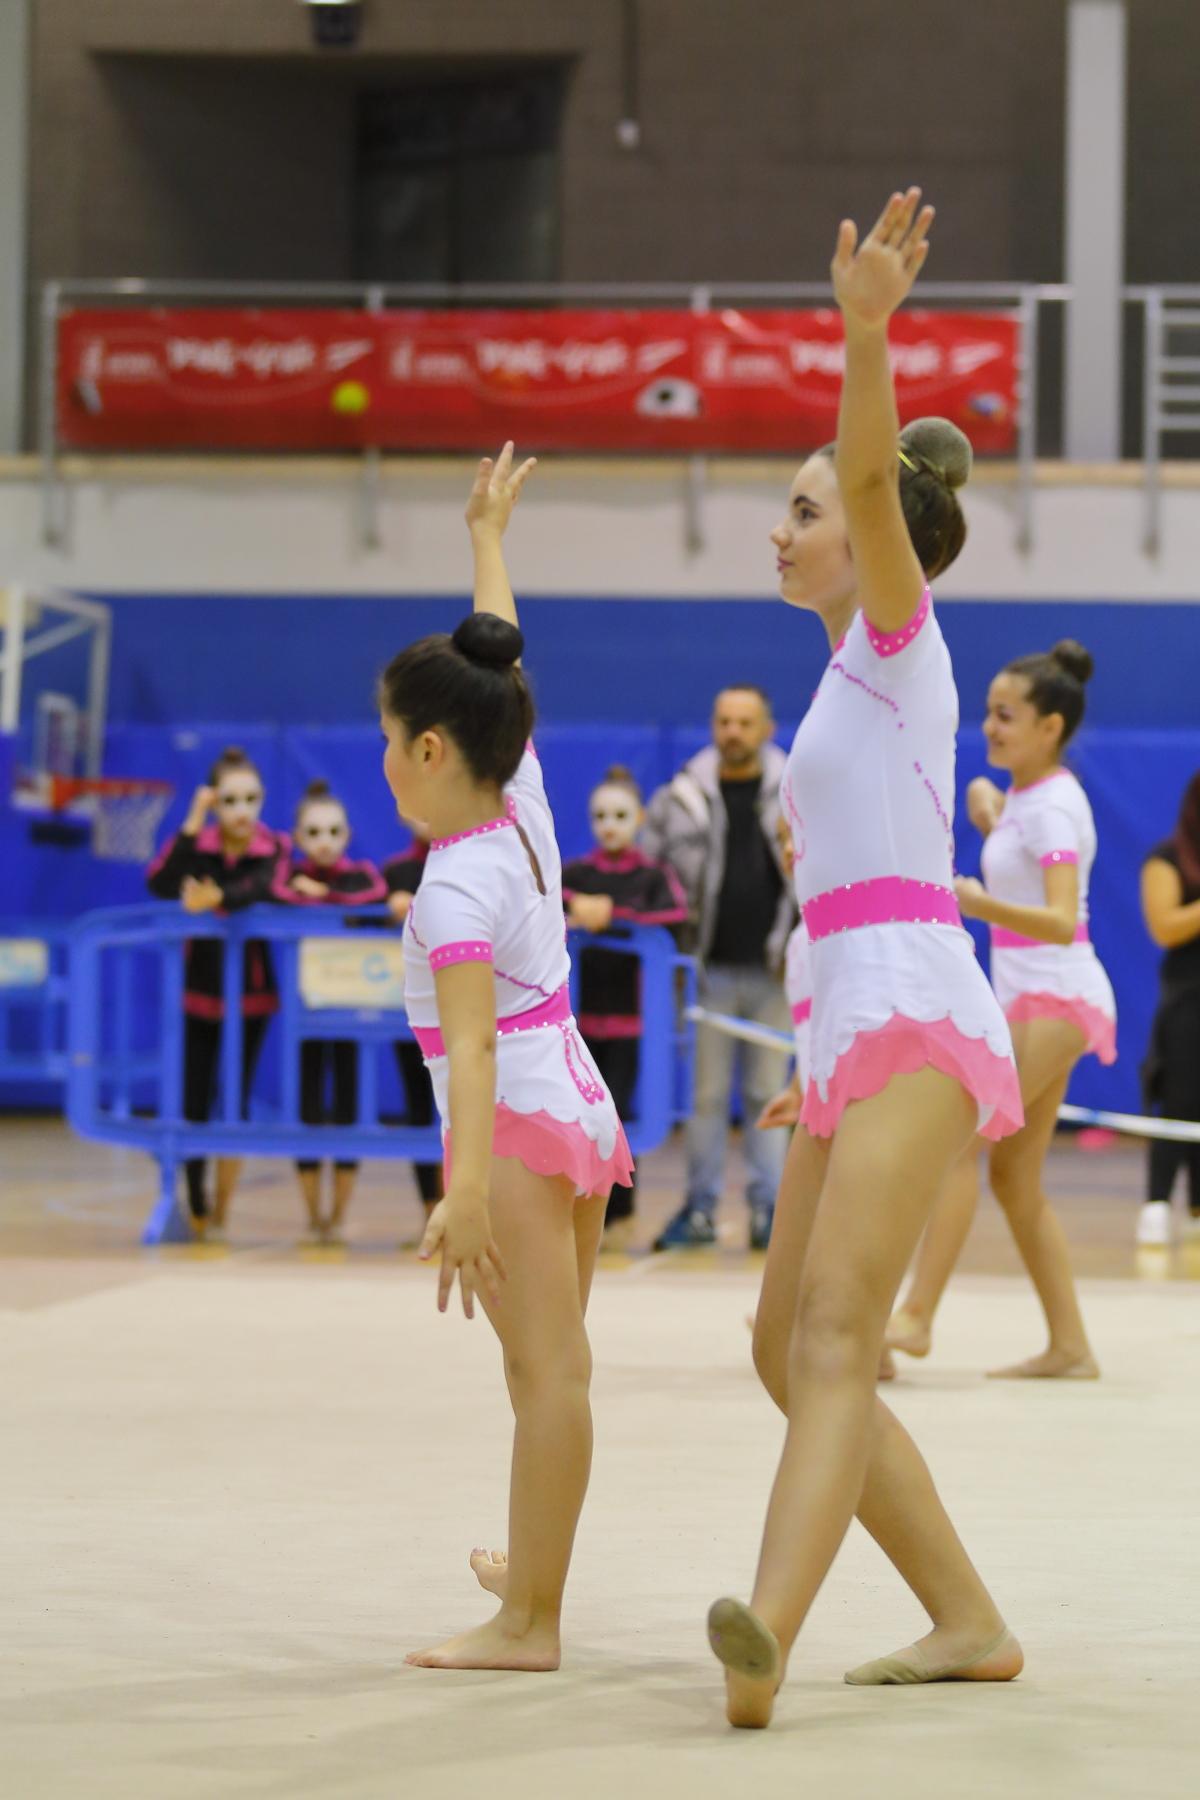 Escuela Deportiva Gimnasia Esttica de Grupo Rosala de Castro  Club de Gimnasia Villa Getafe